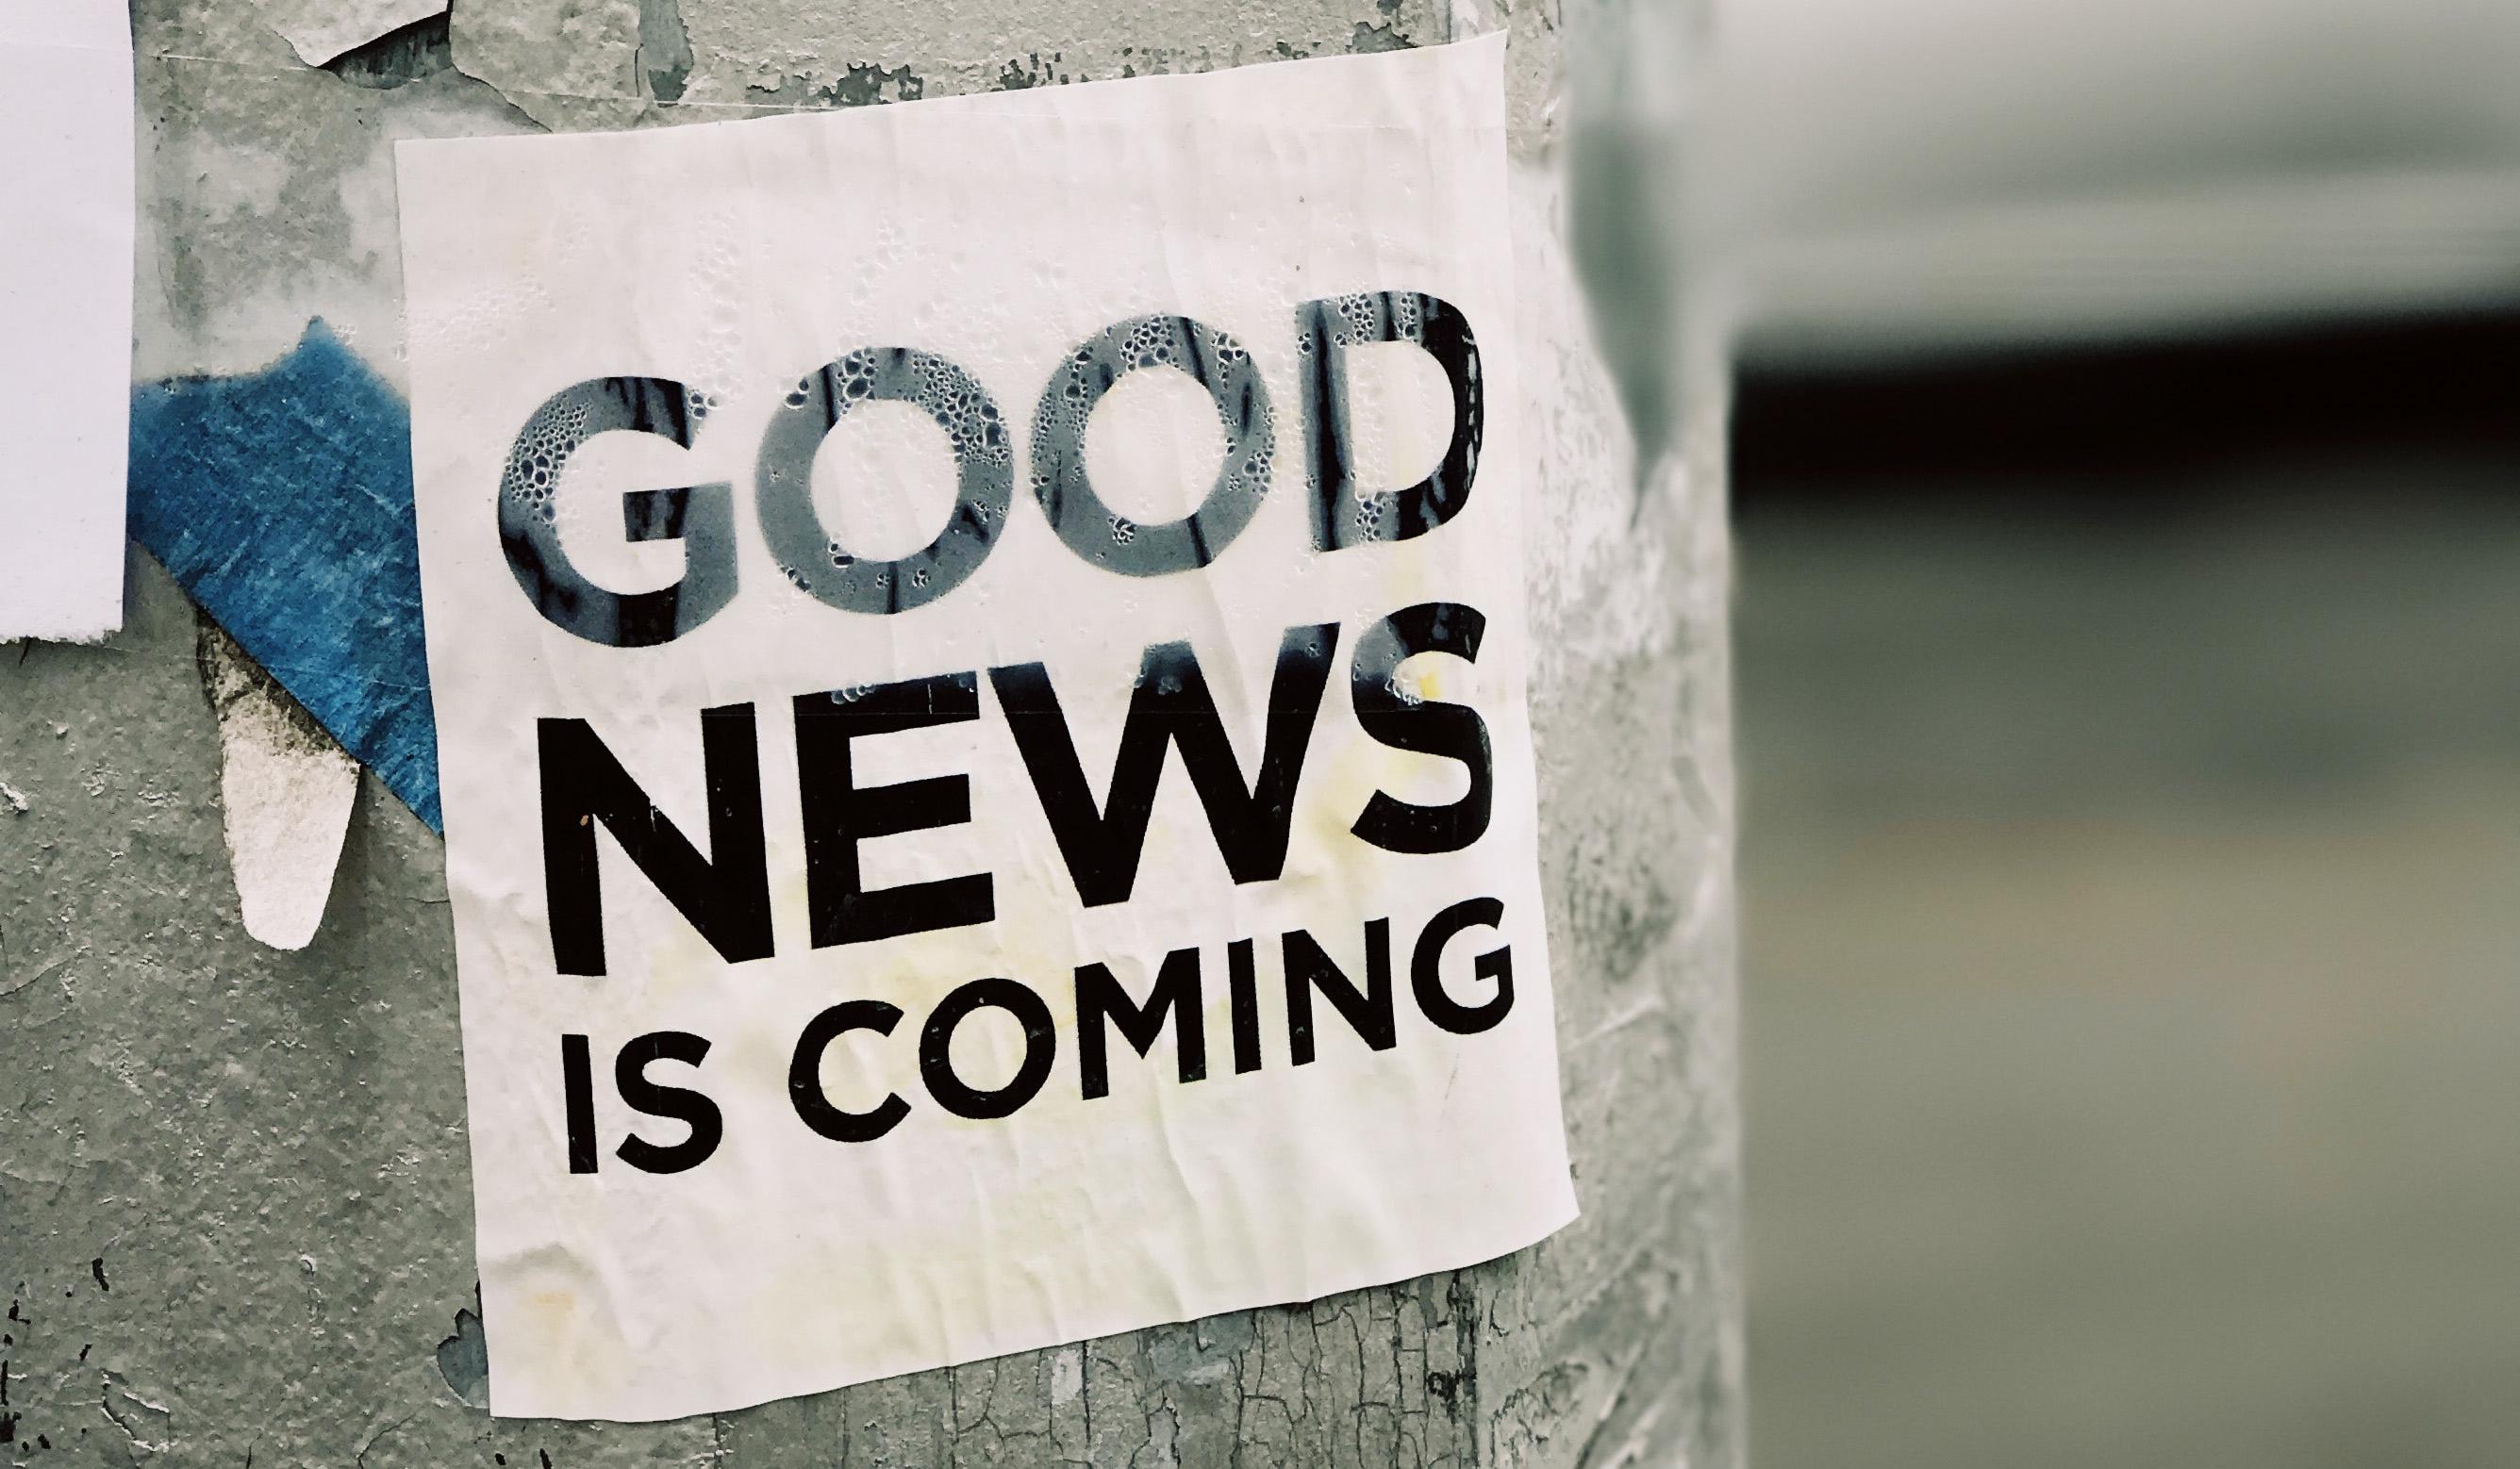 blog-pr-is-dead-good-news-is-coming-social